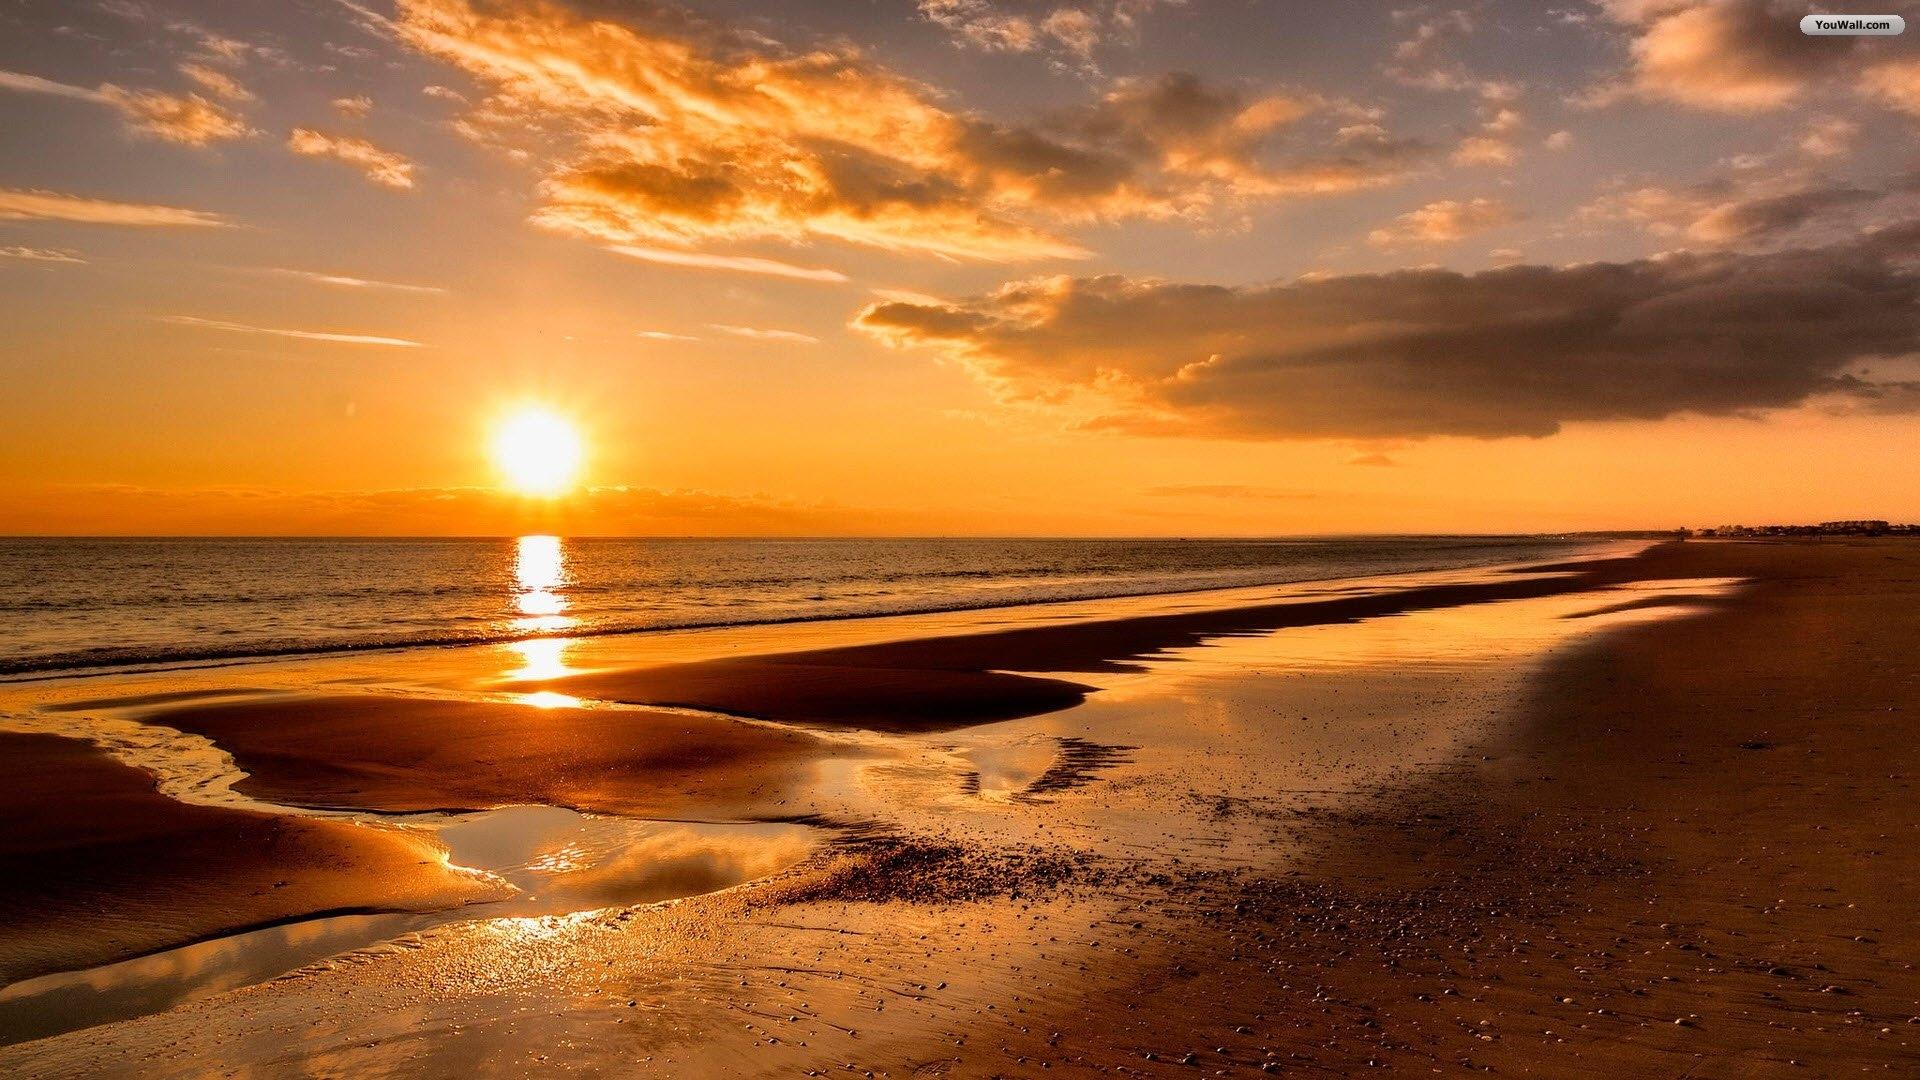 Title Beach Sunset Wallpaper Desktop Hd Of Smartphone Magnificent Dimension 1920 X 1080 File Type JPG JPEG